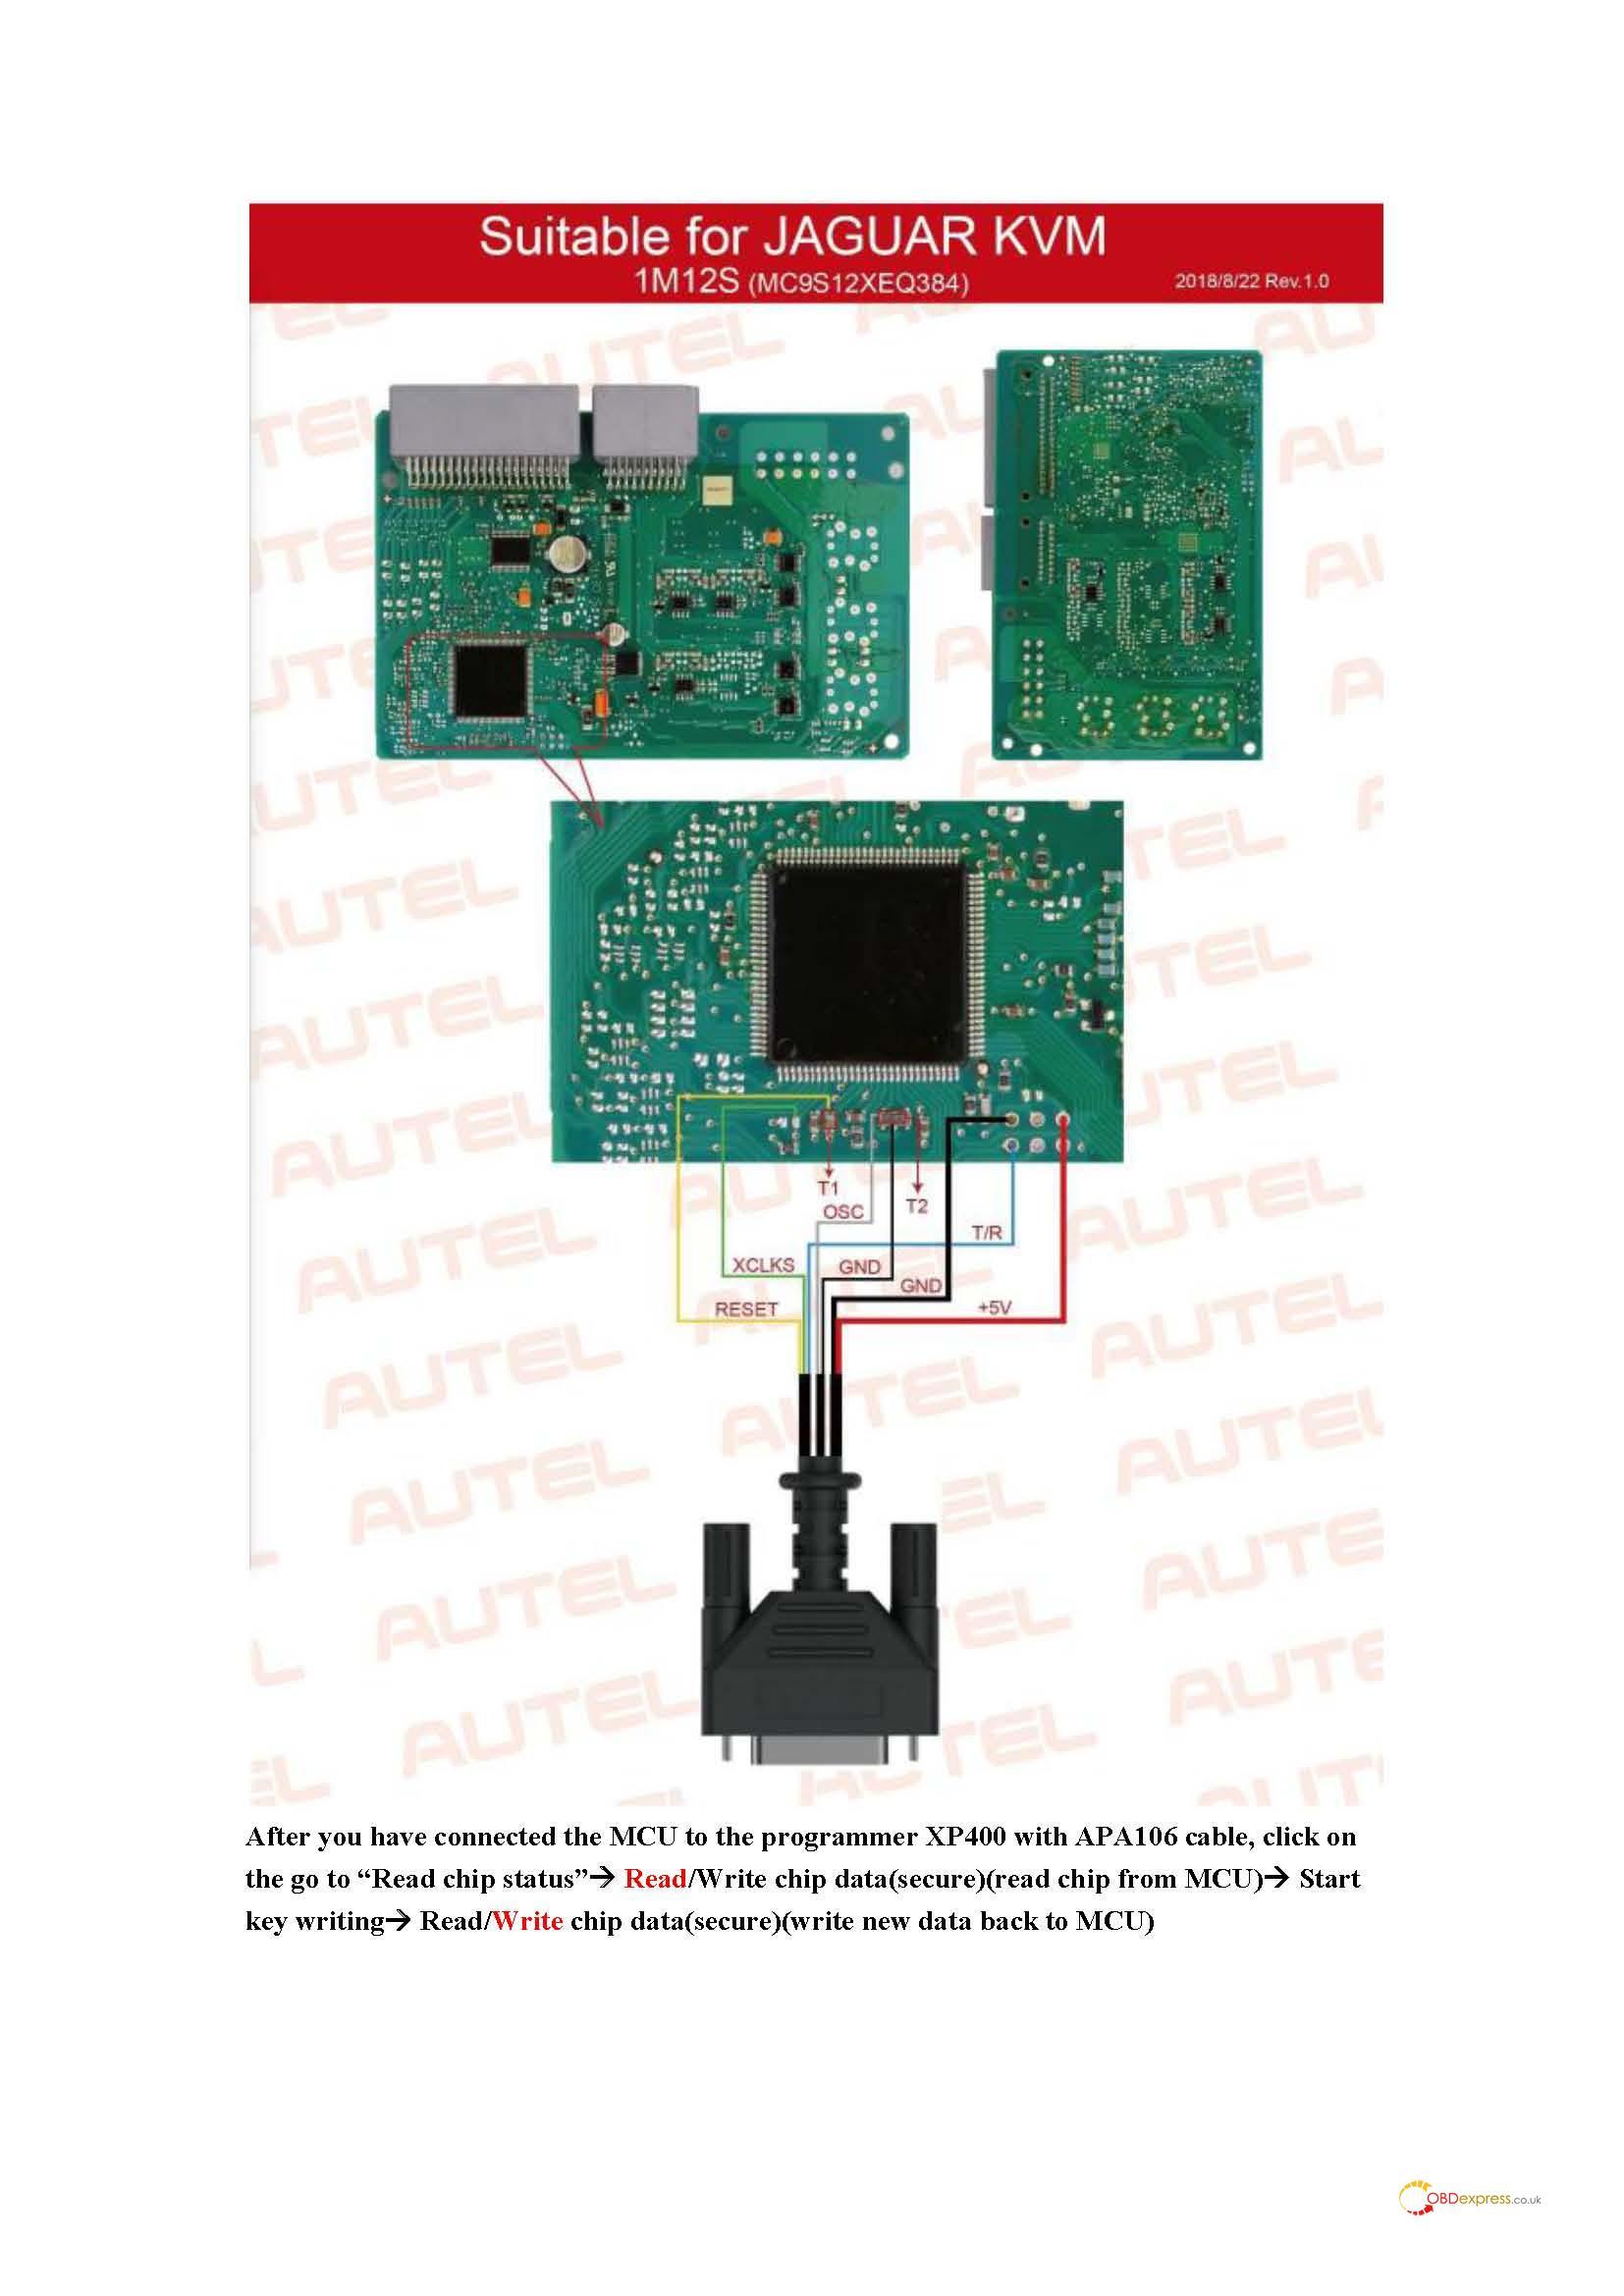 autel im608 range rover 2018 all key lost 09 - Range Rover 2018 AKL with Autel IM608 + XP400 (dump mode) -